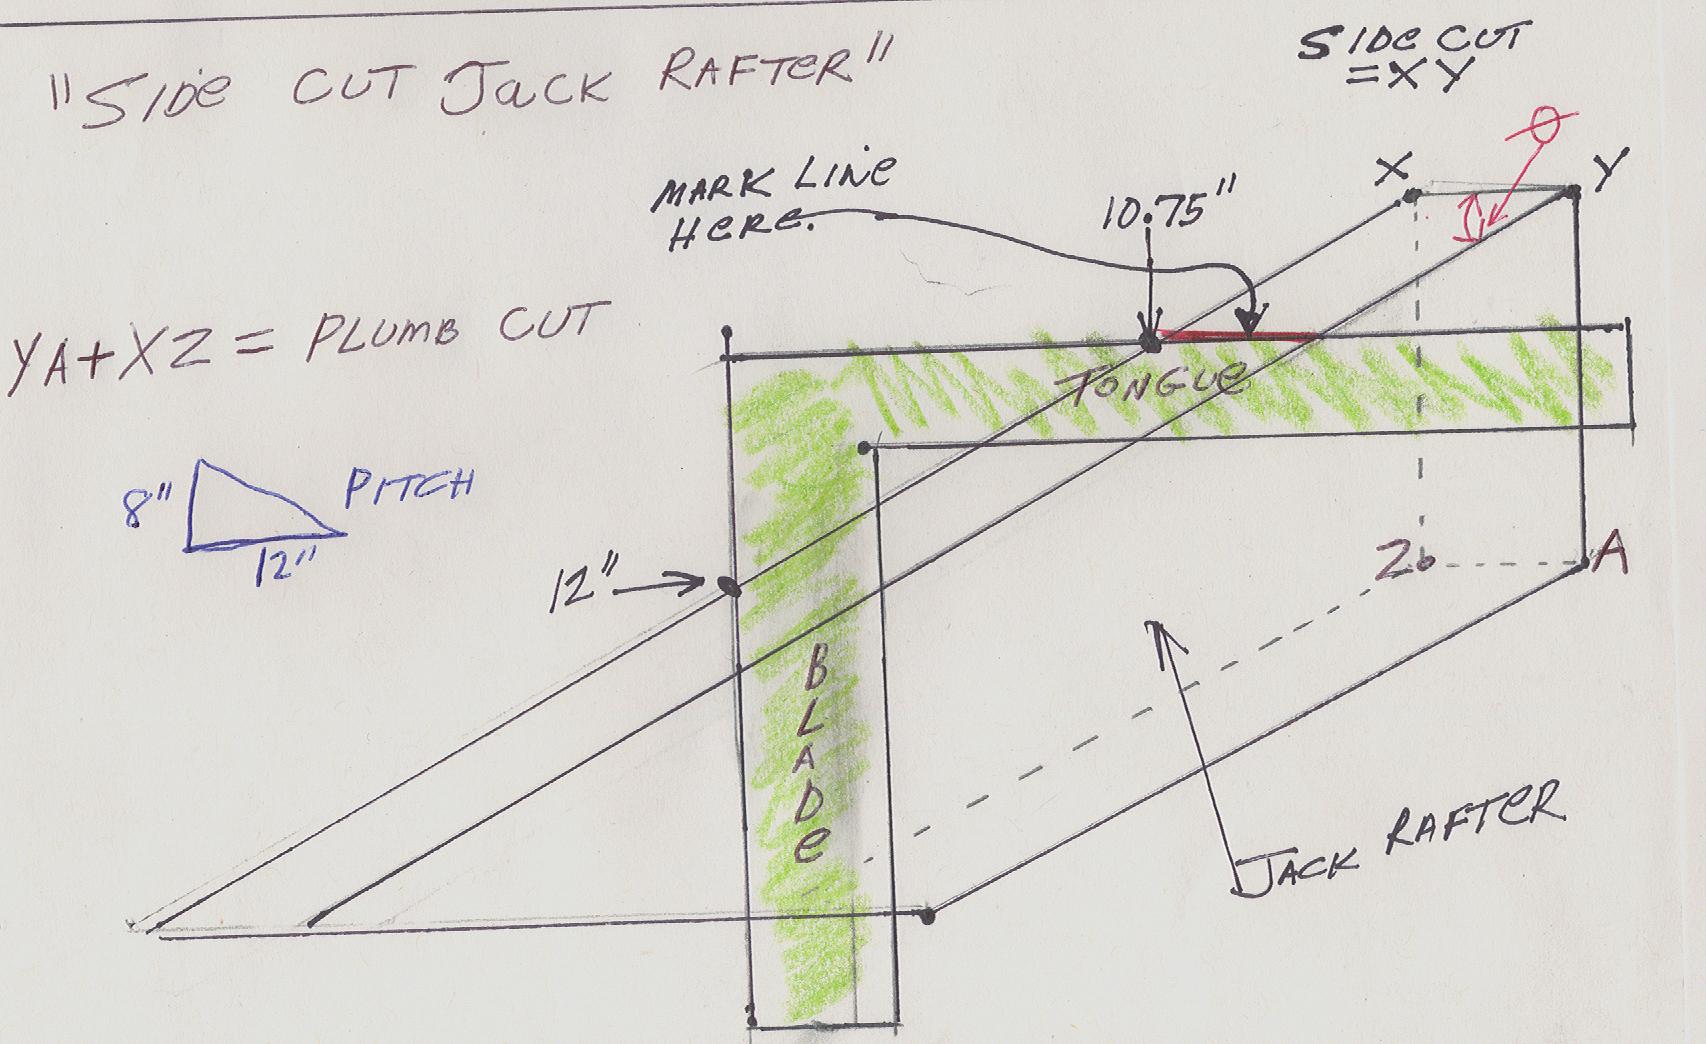 File Jack Rafter Layout 1